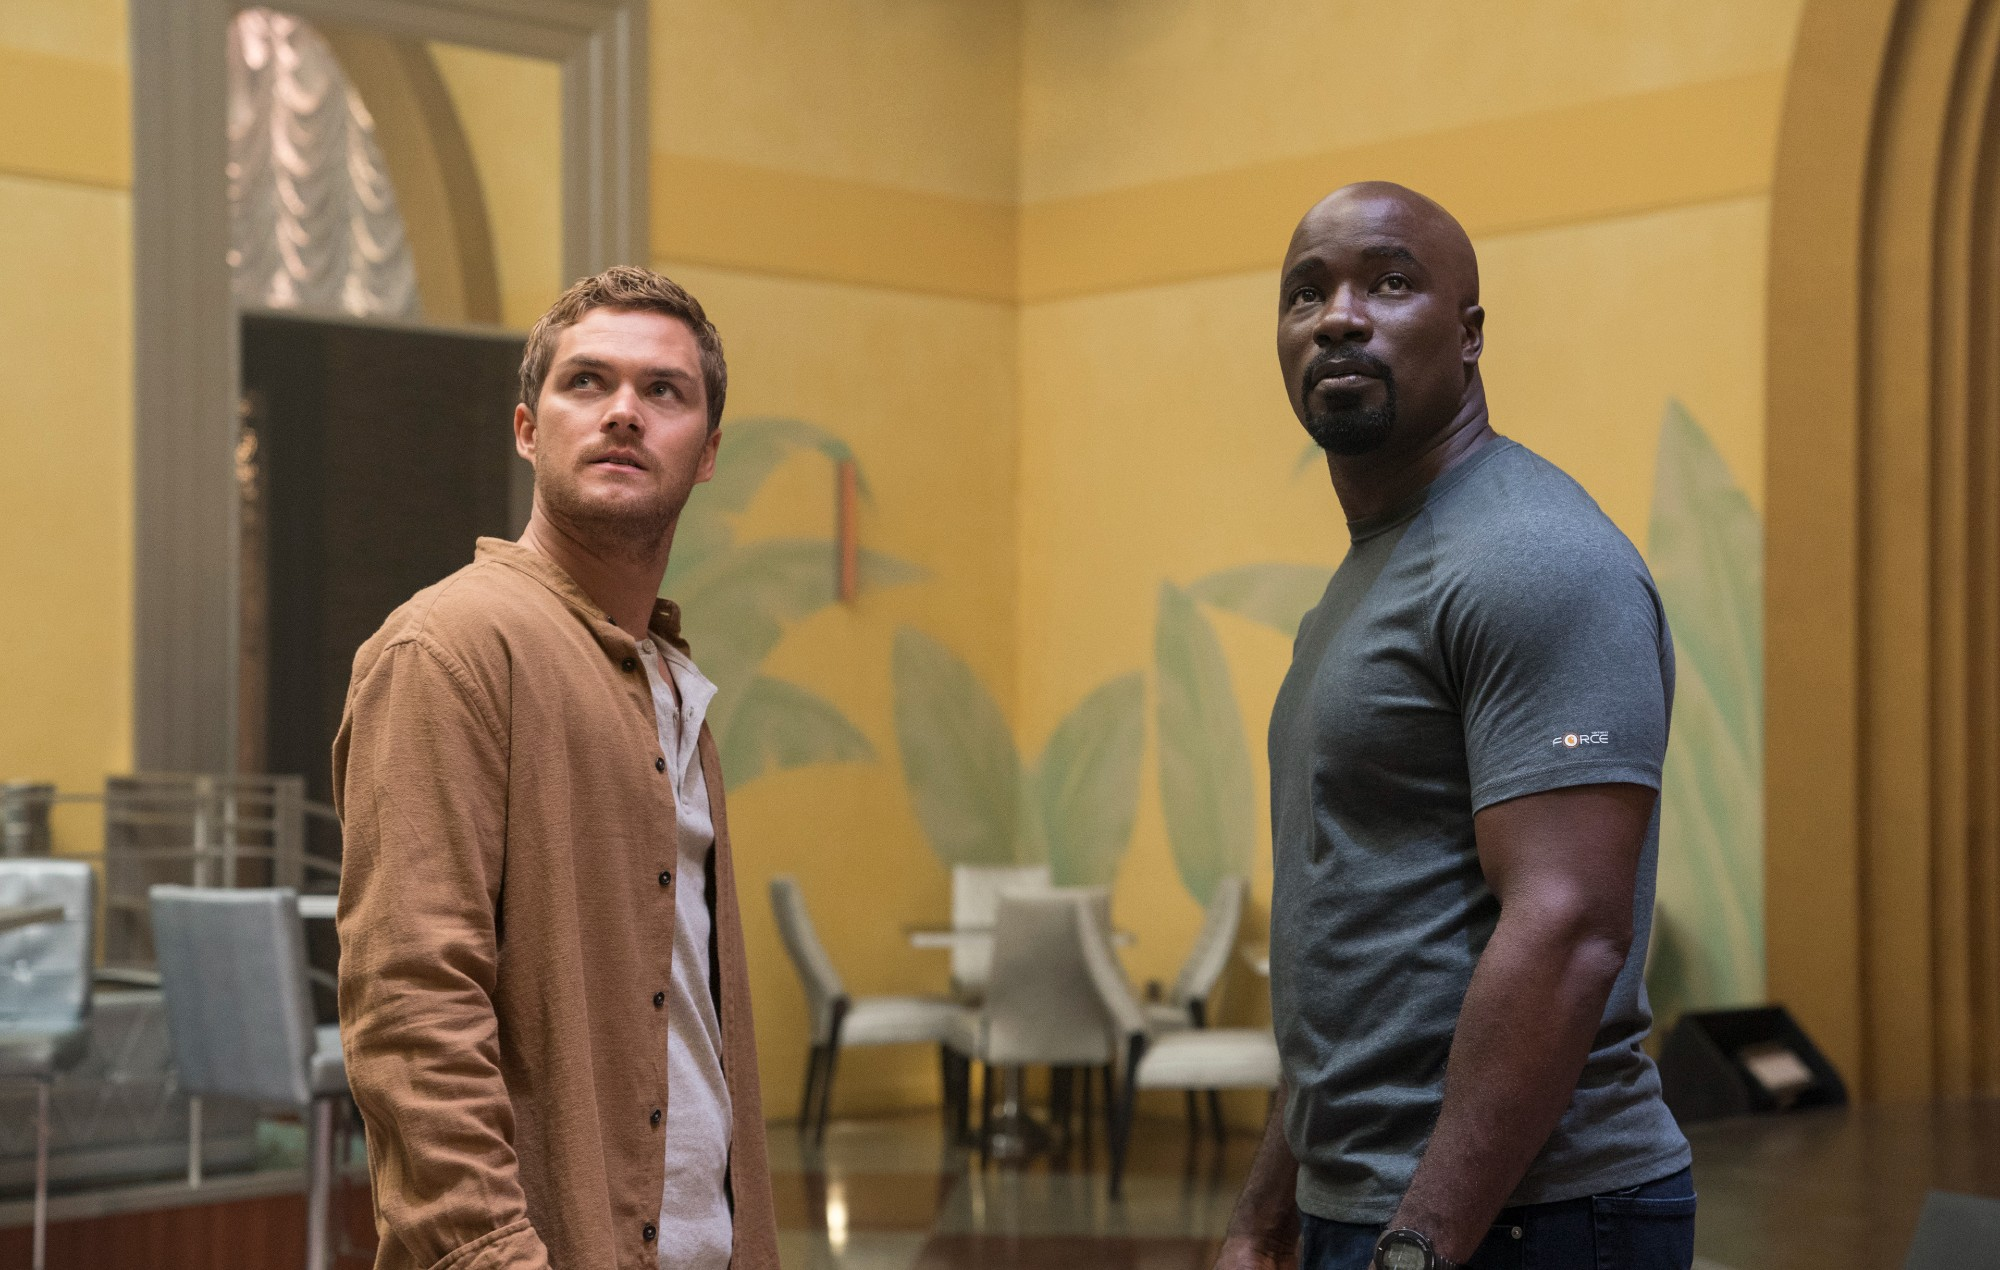 Luke Cage season 2 with Iron Fist